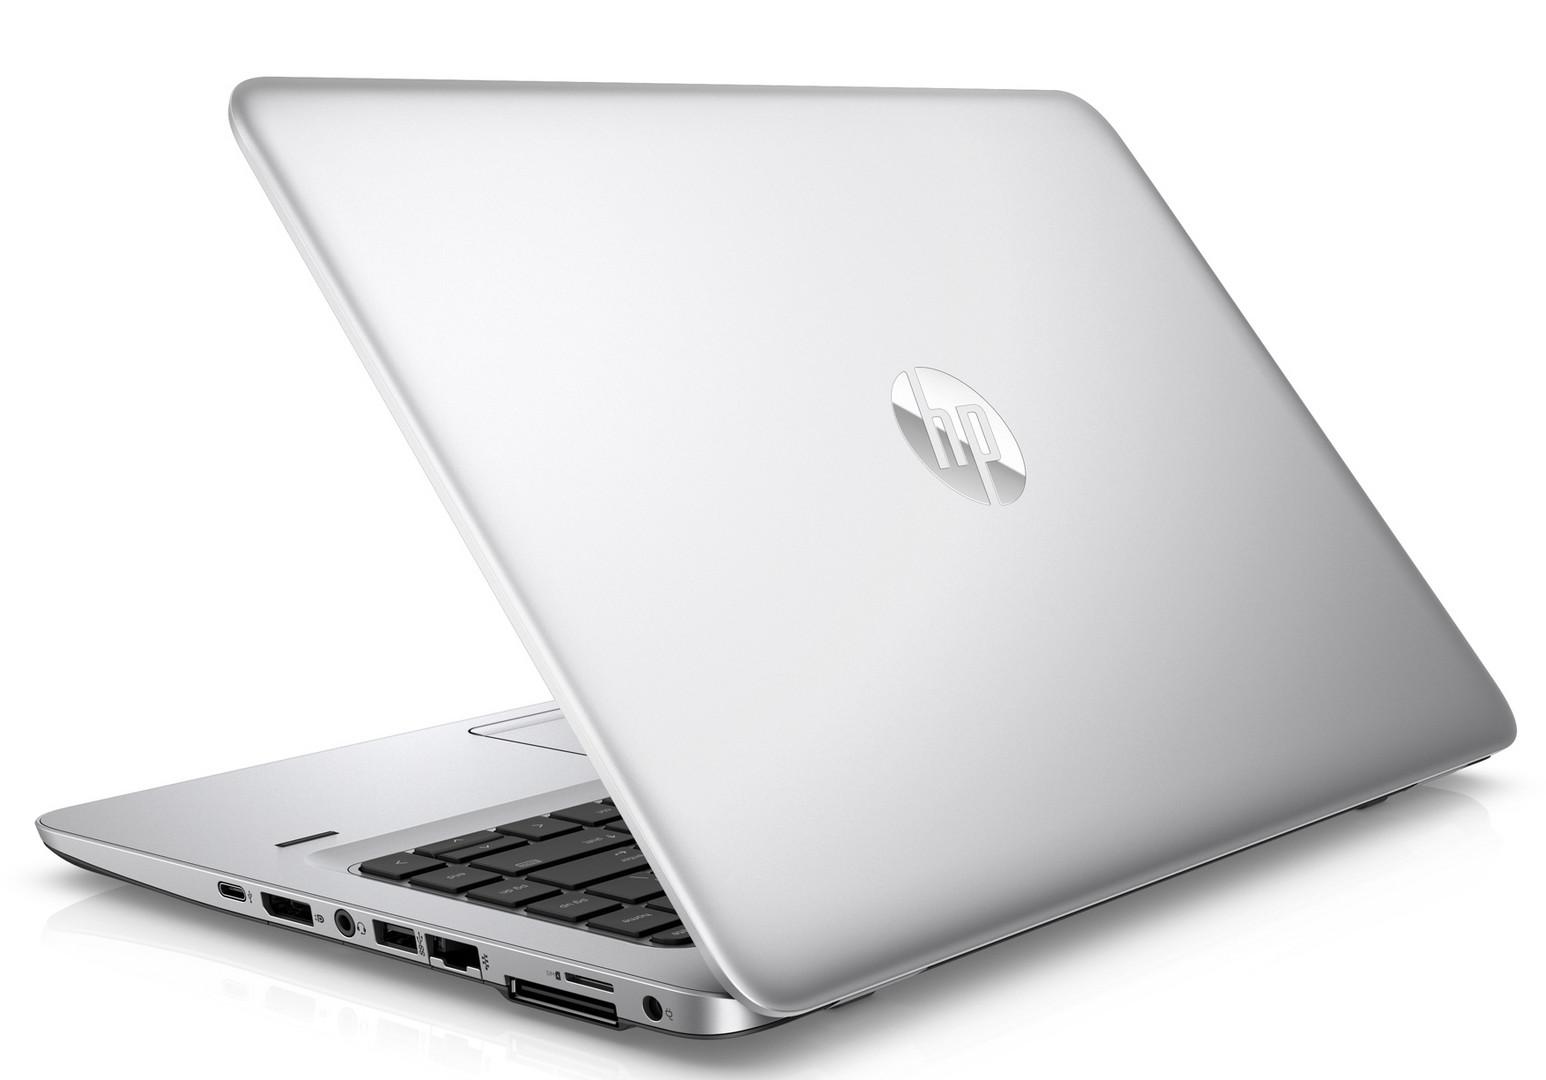 HP mt43 (A8-9600B, SSD, FHD) Thin Client Review - NotebookCheck net